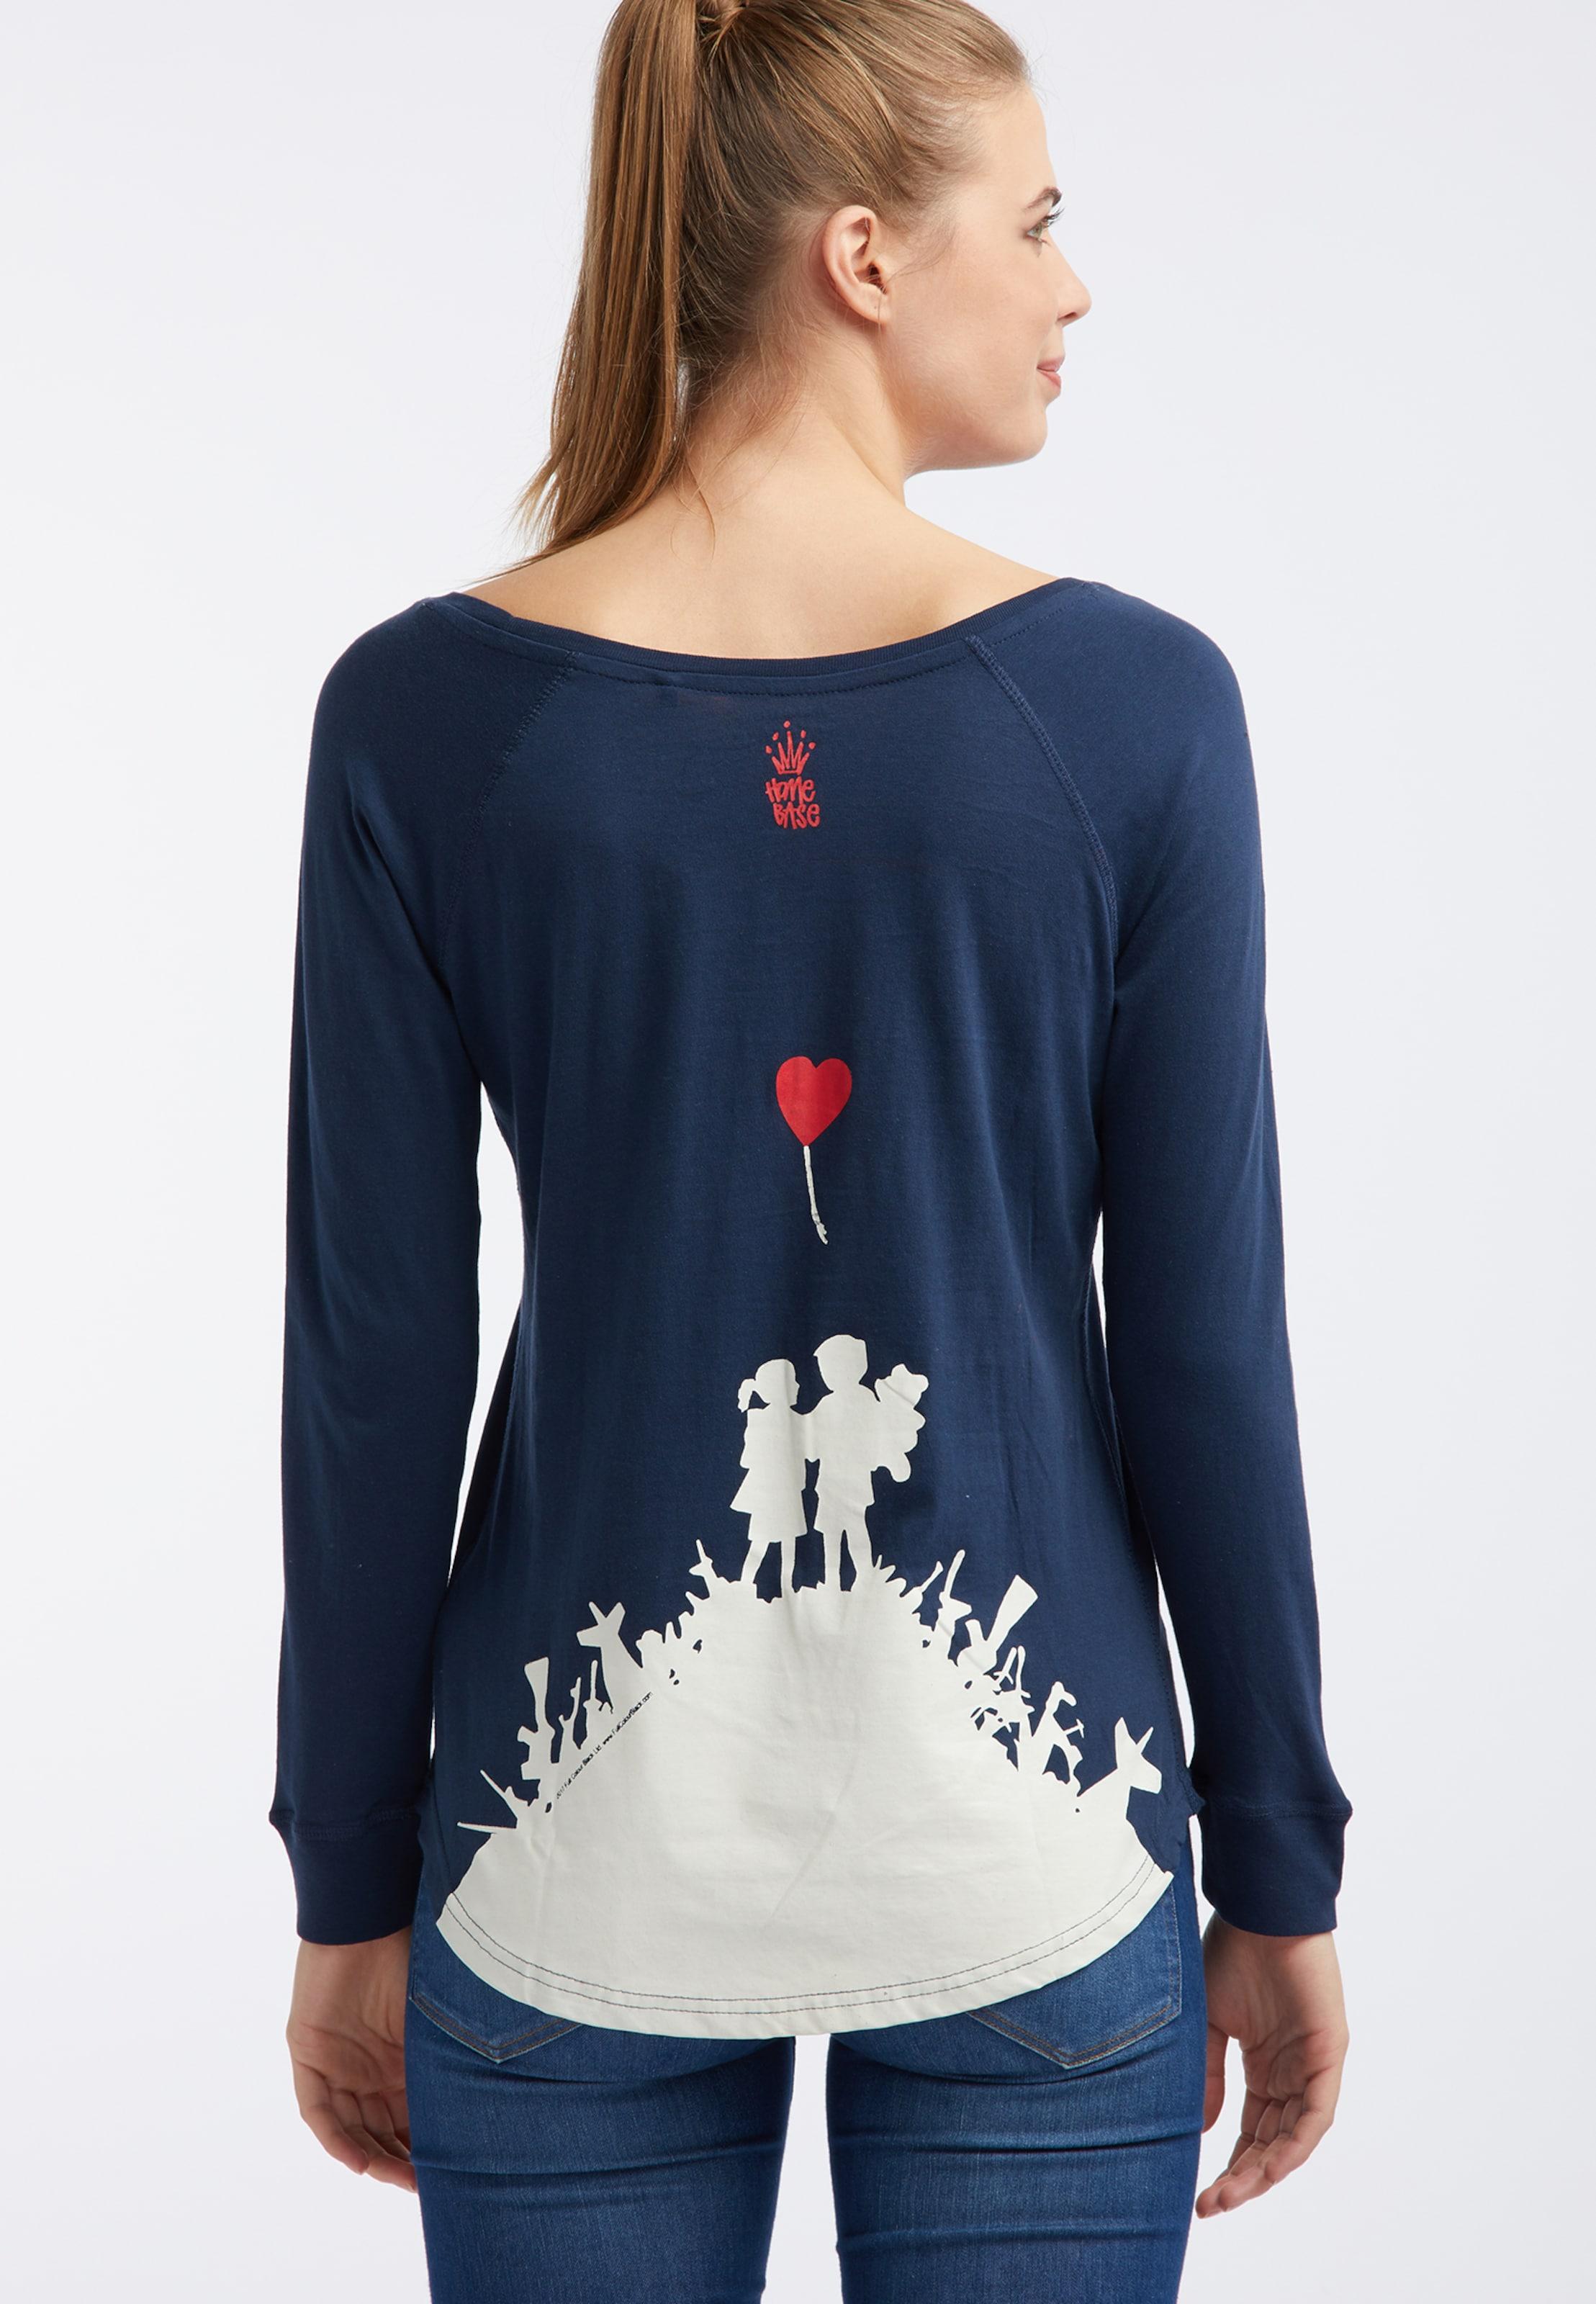 shirt MarineMélange Couleurs T Homebase De En 34ARLj5